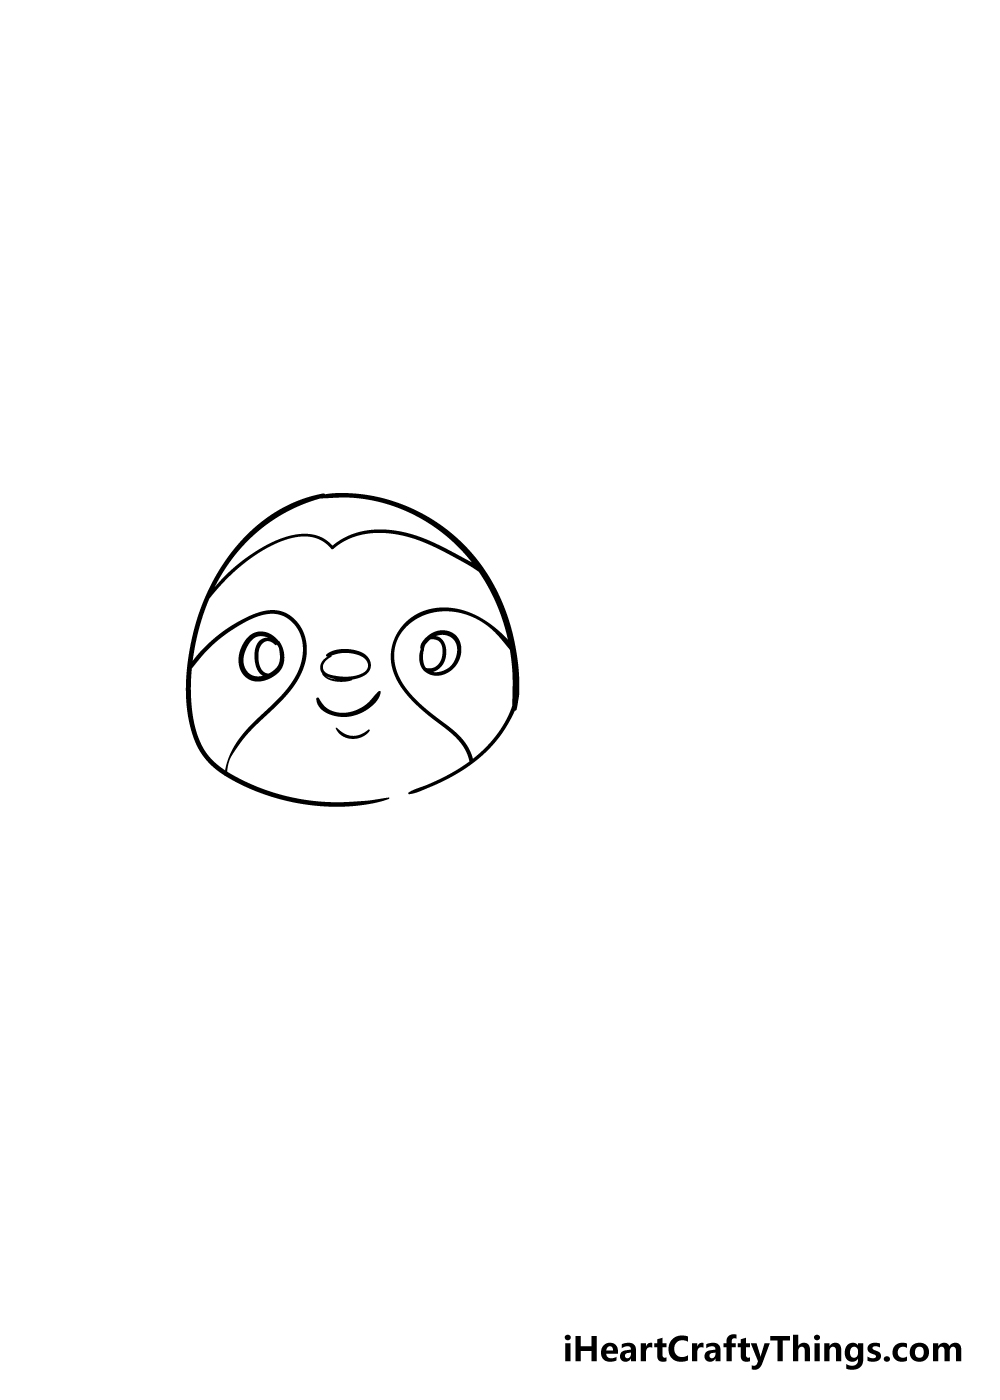 sloth drawing step 2